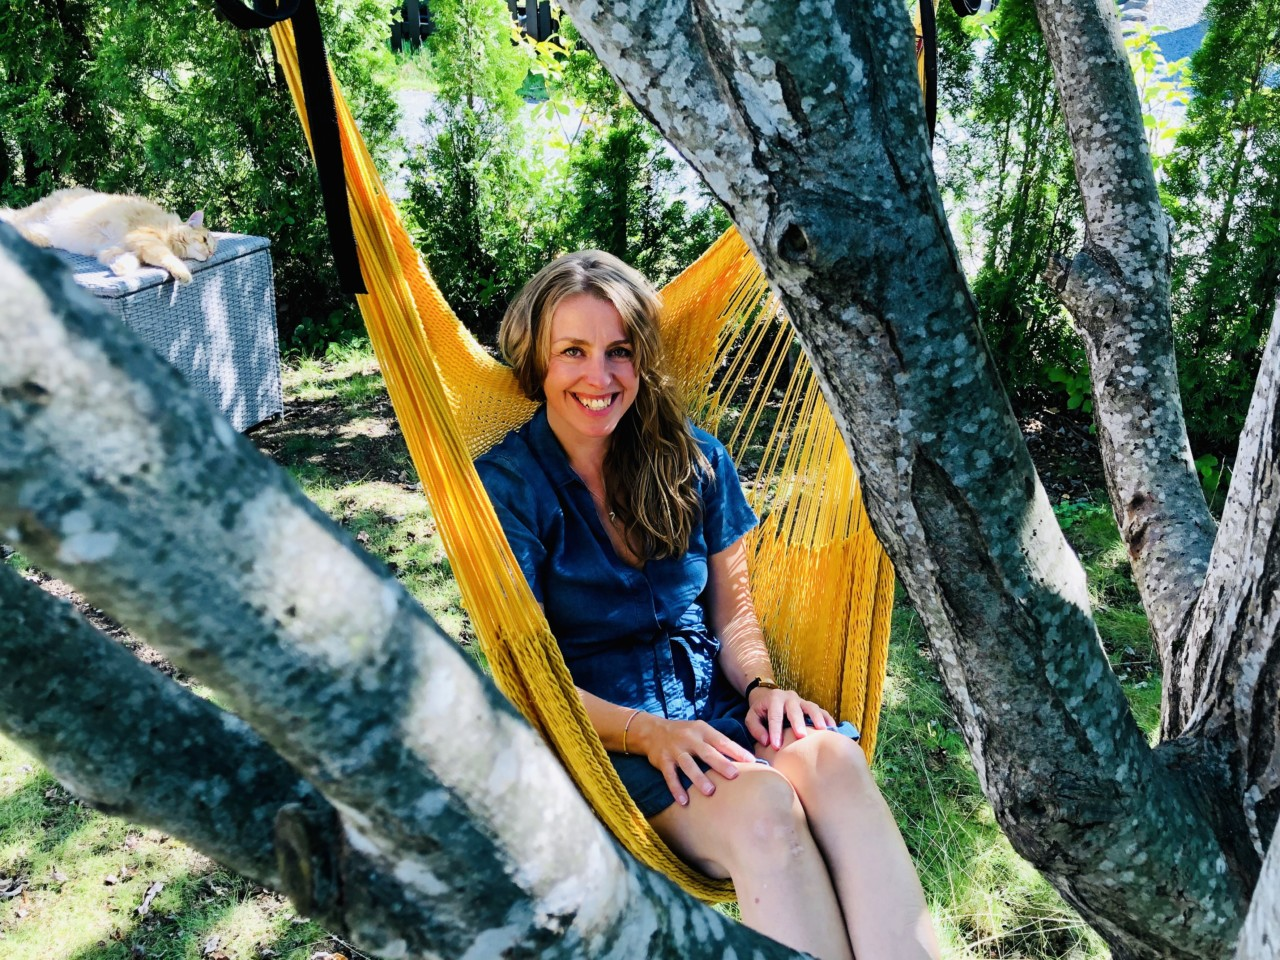 anja-stang-amta-intervju-portrett-lokalavisa-nesodden-green-house